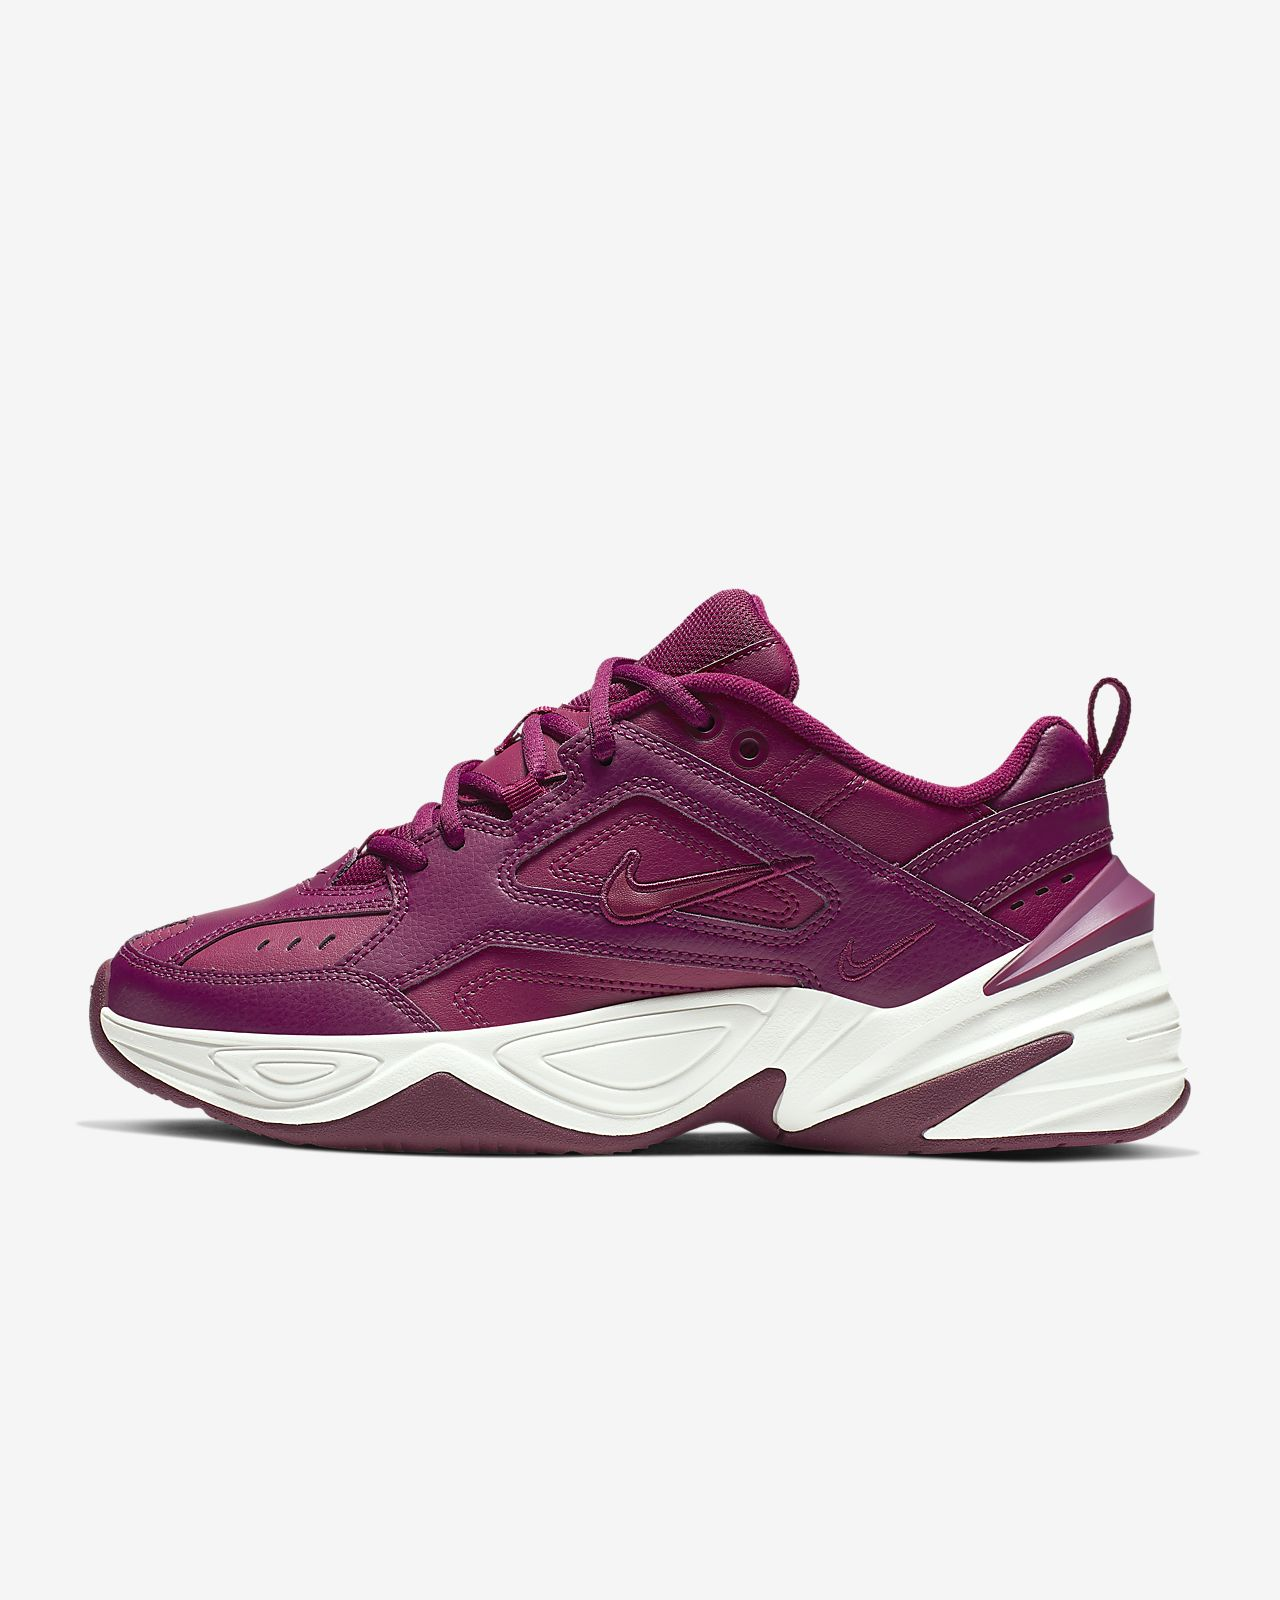 Nike M2K Tekno Pink Release Info |